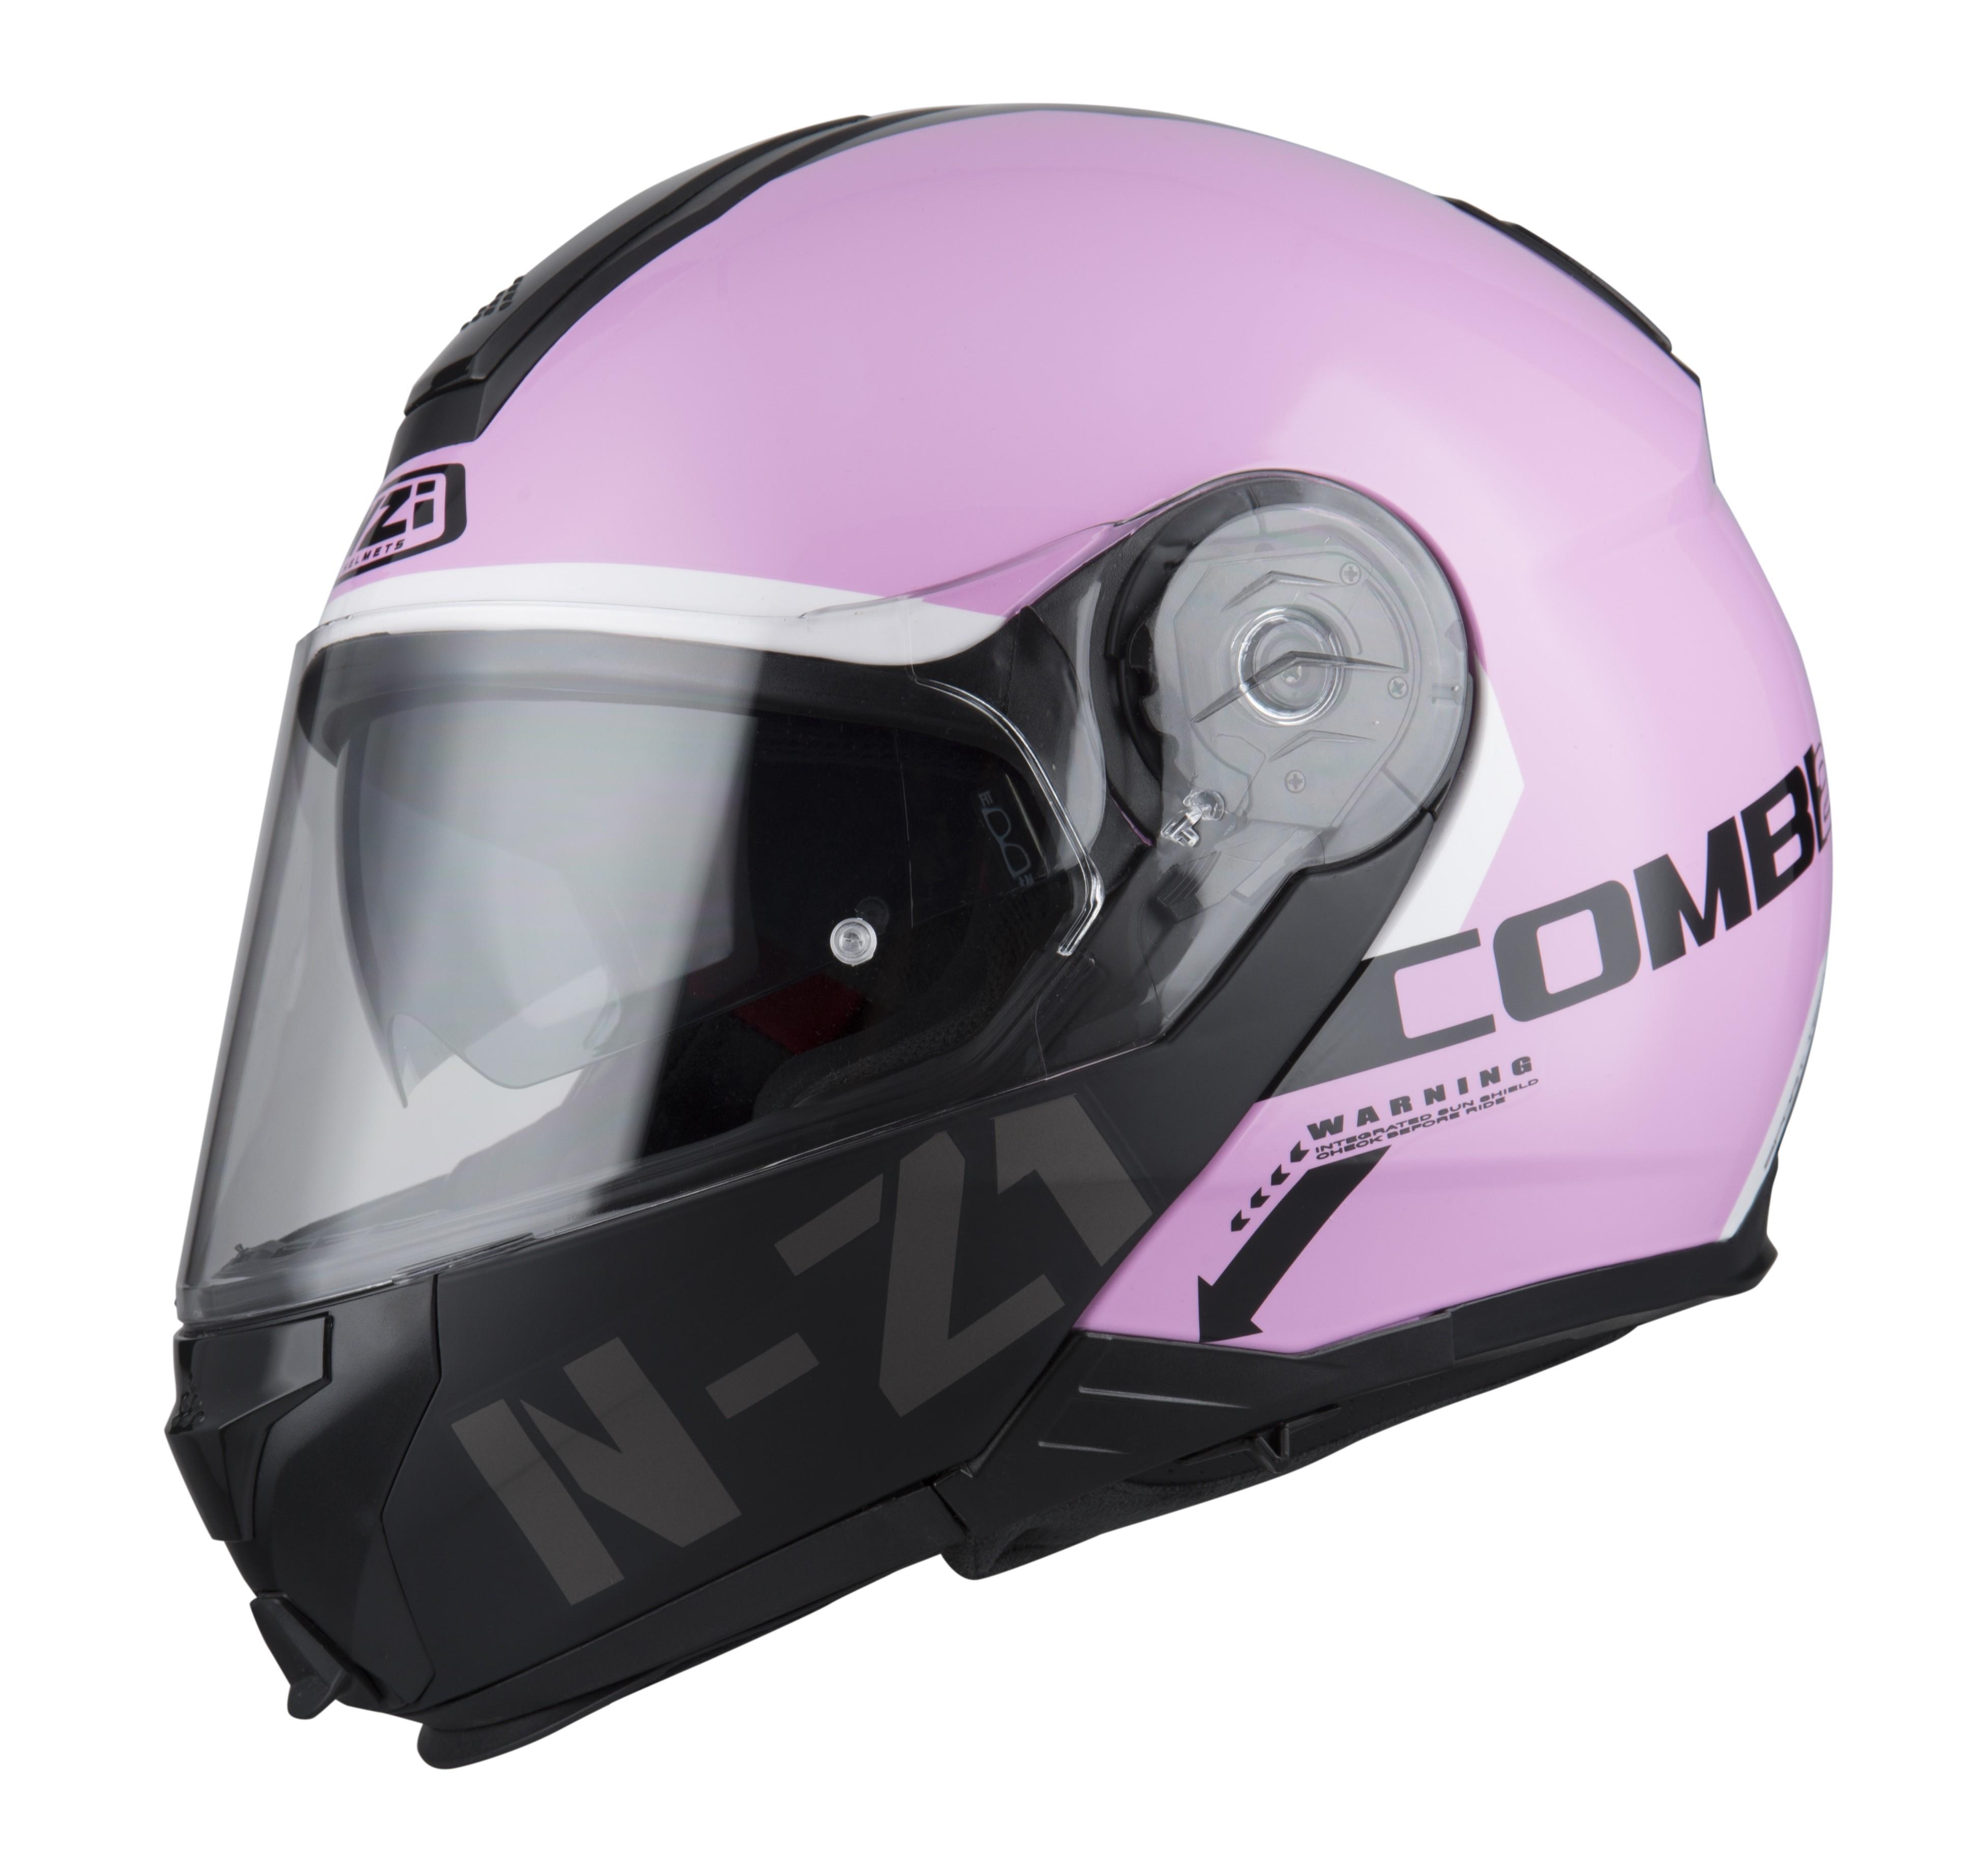 casco-nzi-combi2-duo-graphics-flydeck-rosa-brillante-shell-mate-chin-bar